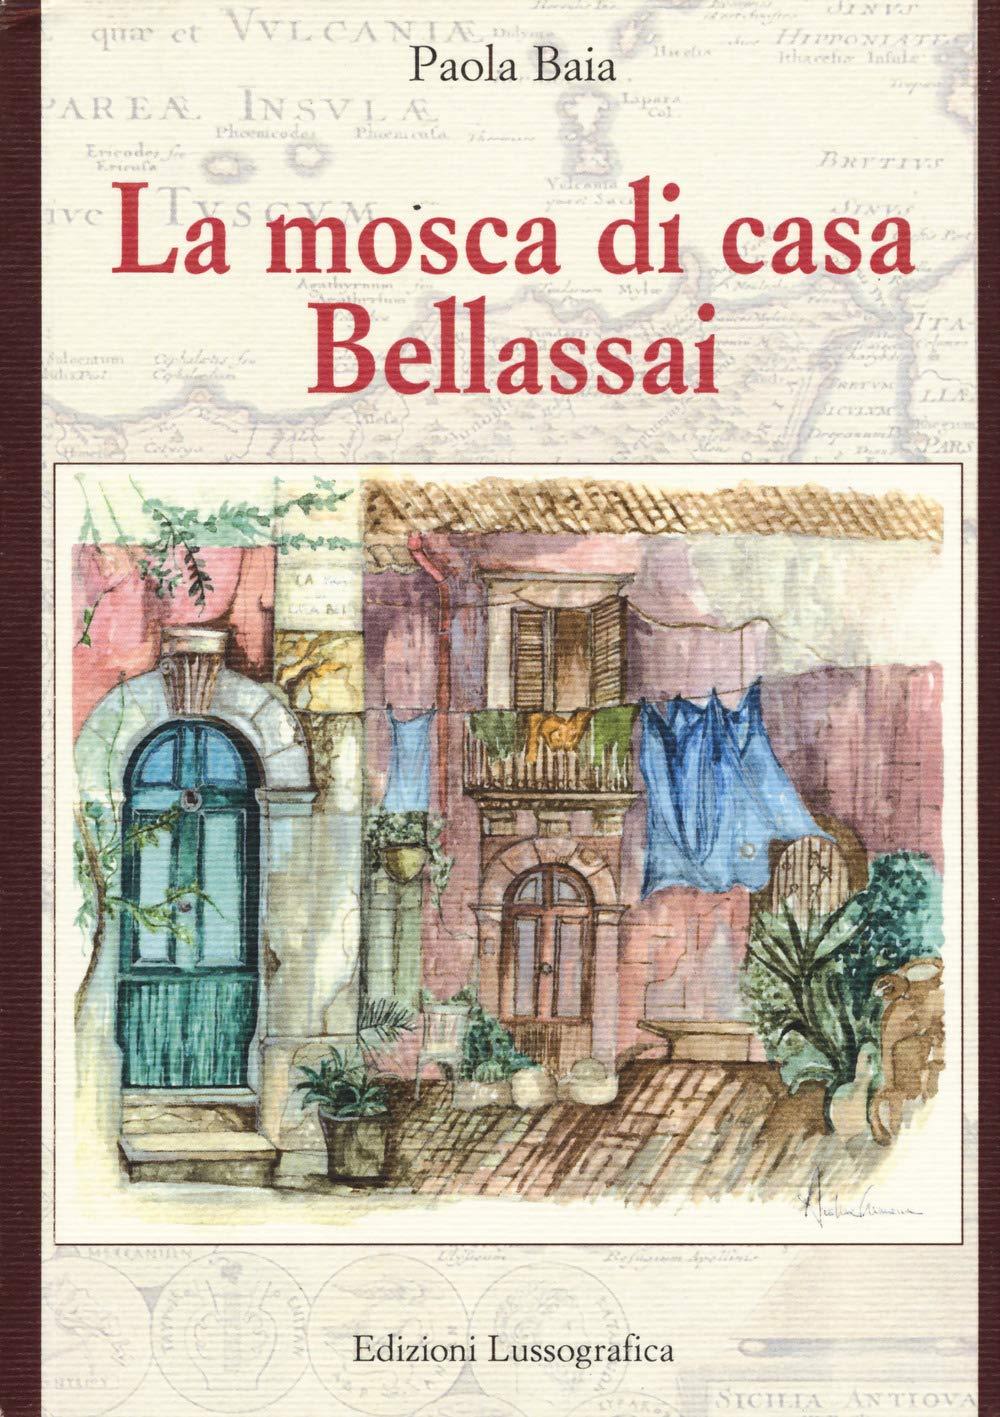 La mosca di casa Bellassai. Nuova ediz. Limmagine rovesciata: Amazon.es: Baia, Paola: Libros en idiomas extranjeros